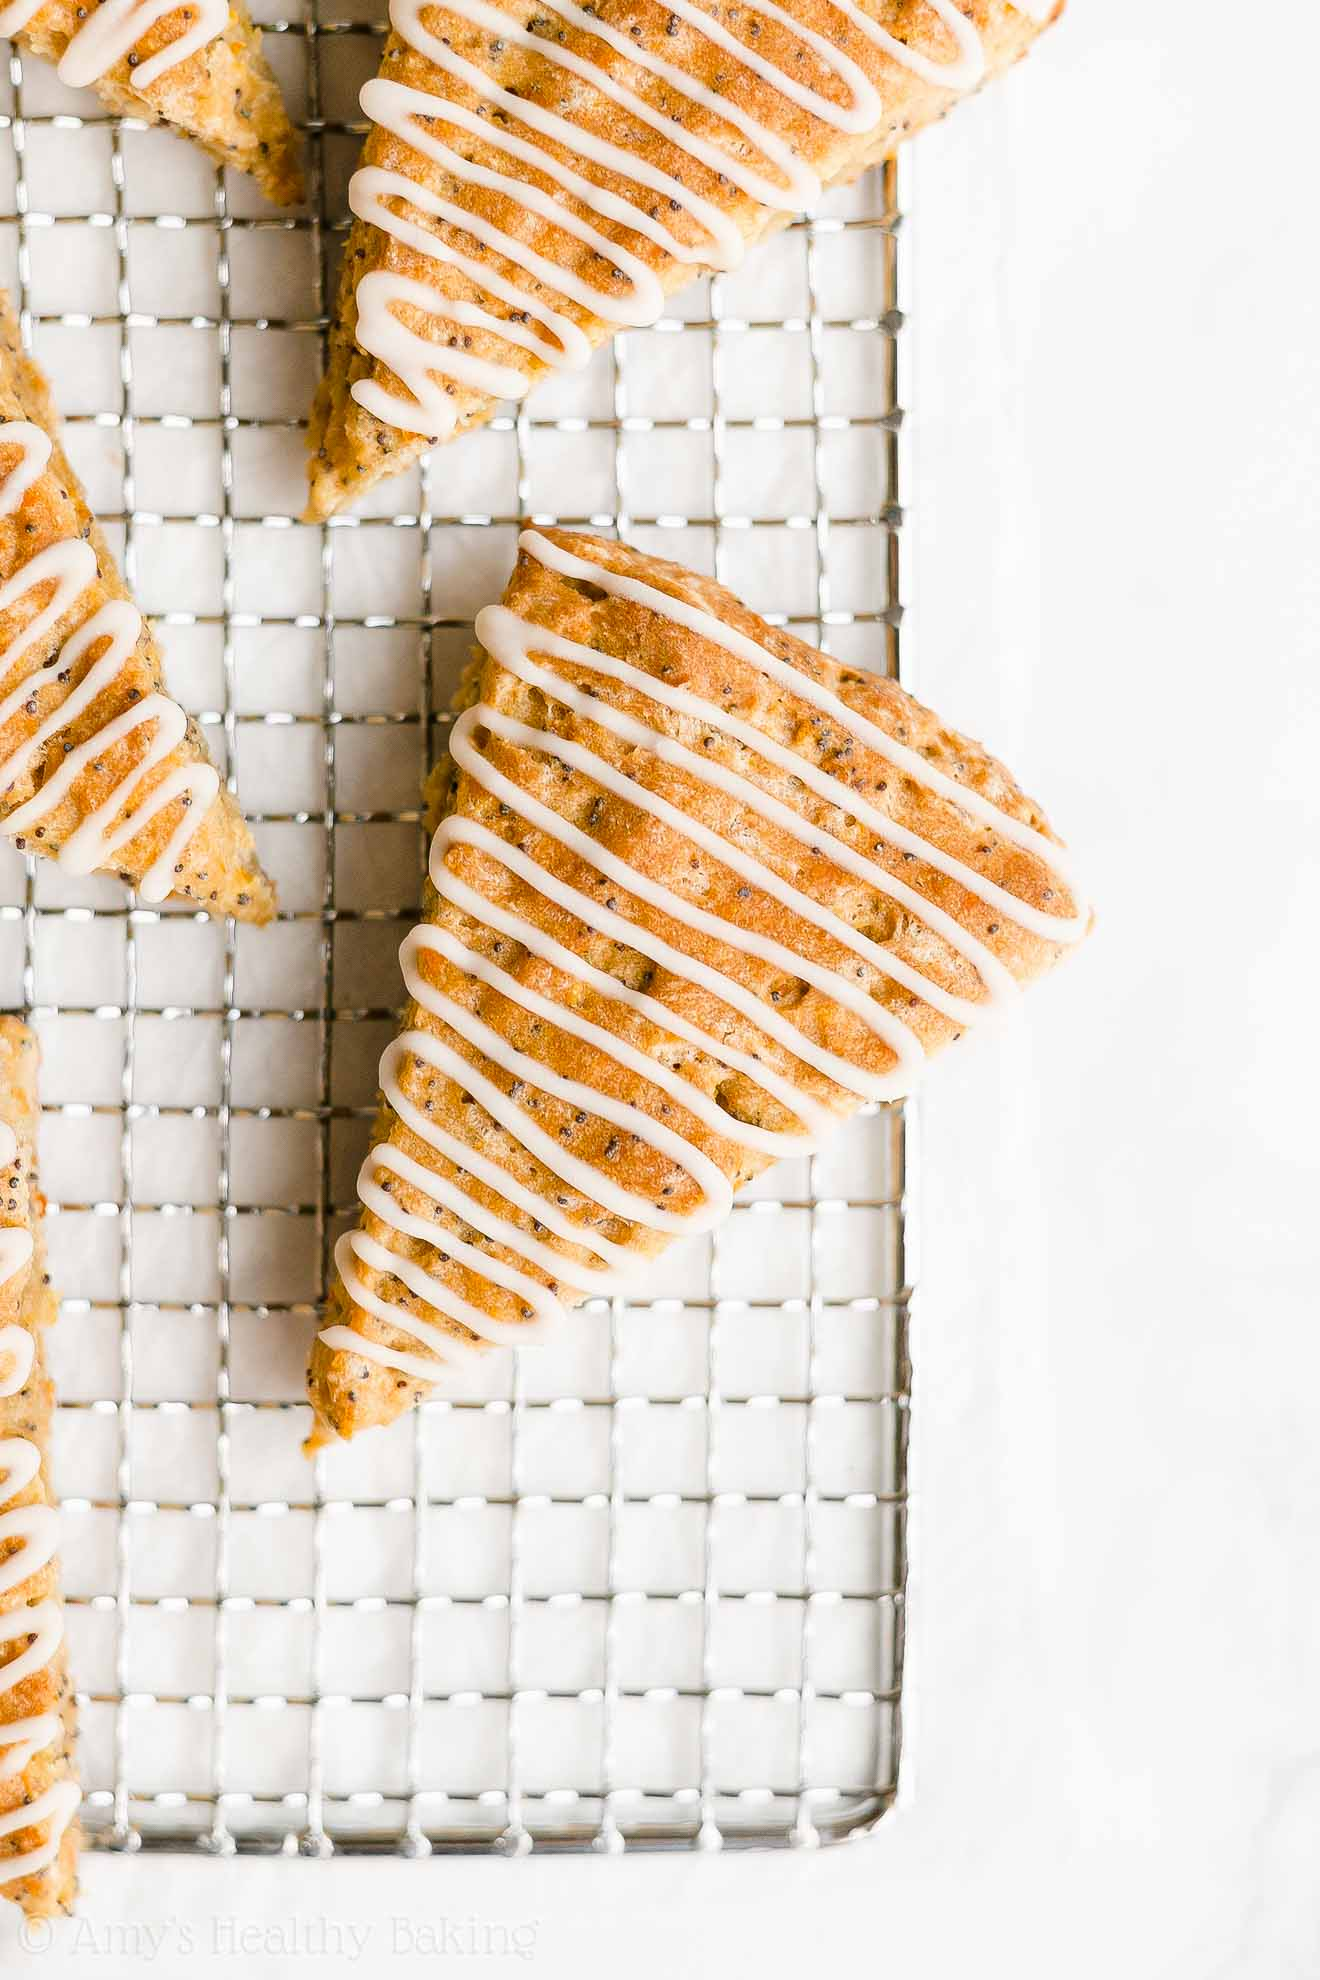 Easy Healthy Whole Wheat Low Fat Low Sugar Orange Poppy Seed Scones